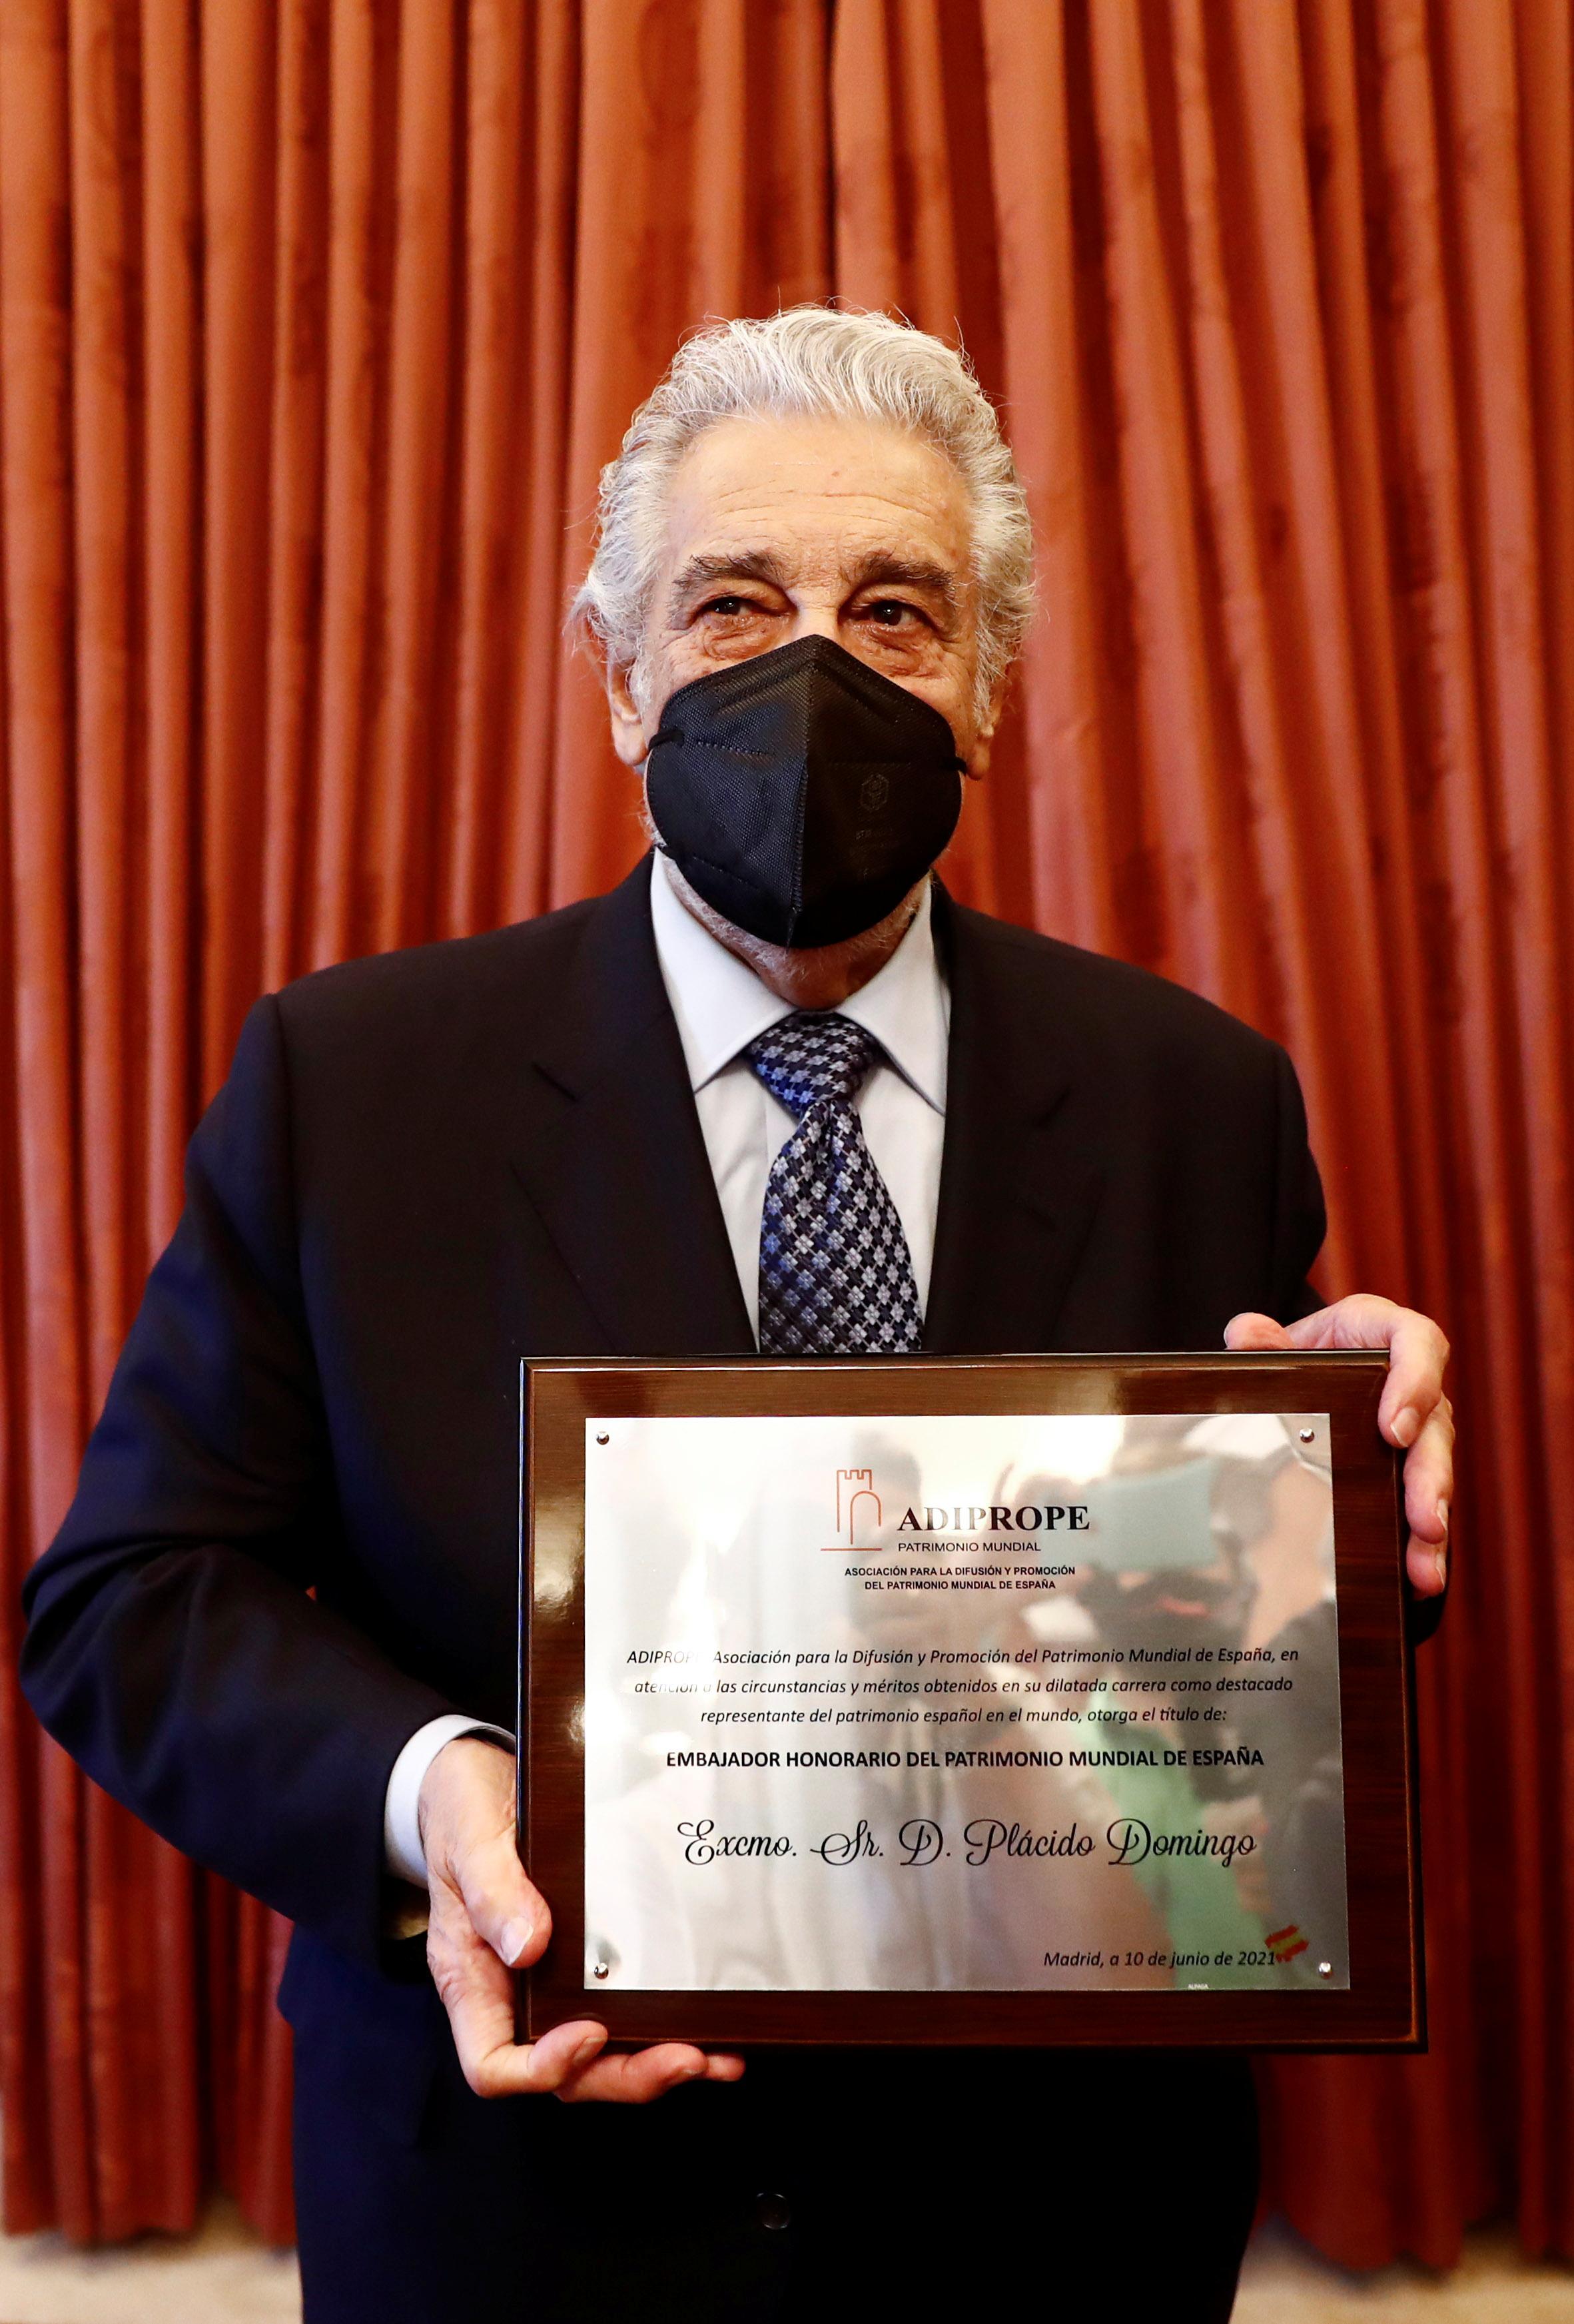 Spanish tenor Placido Domingo receives the